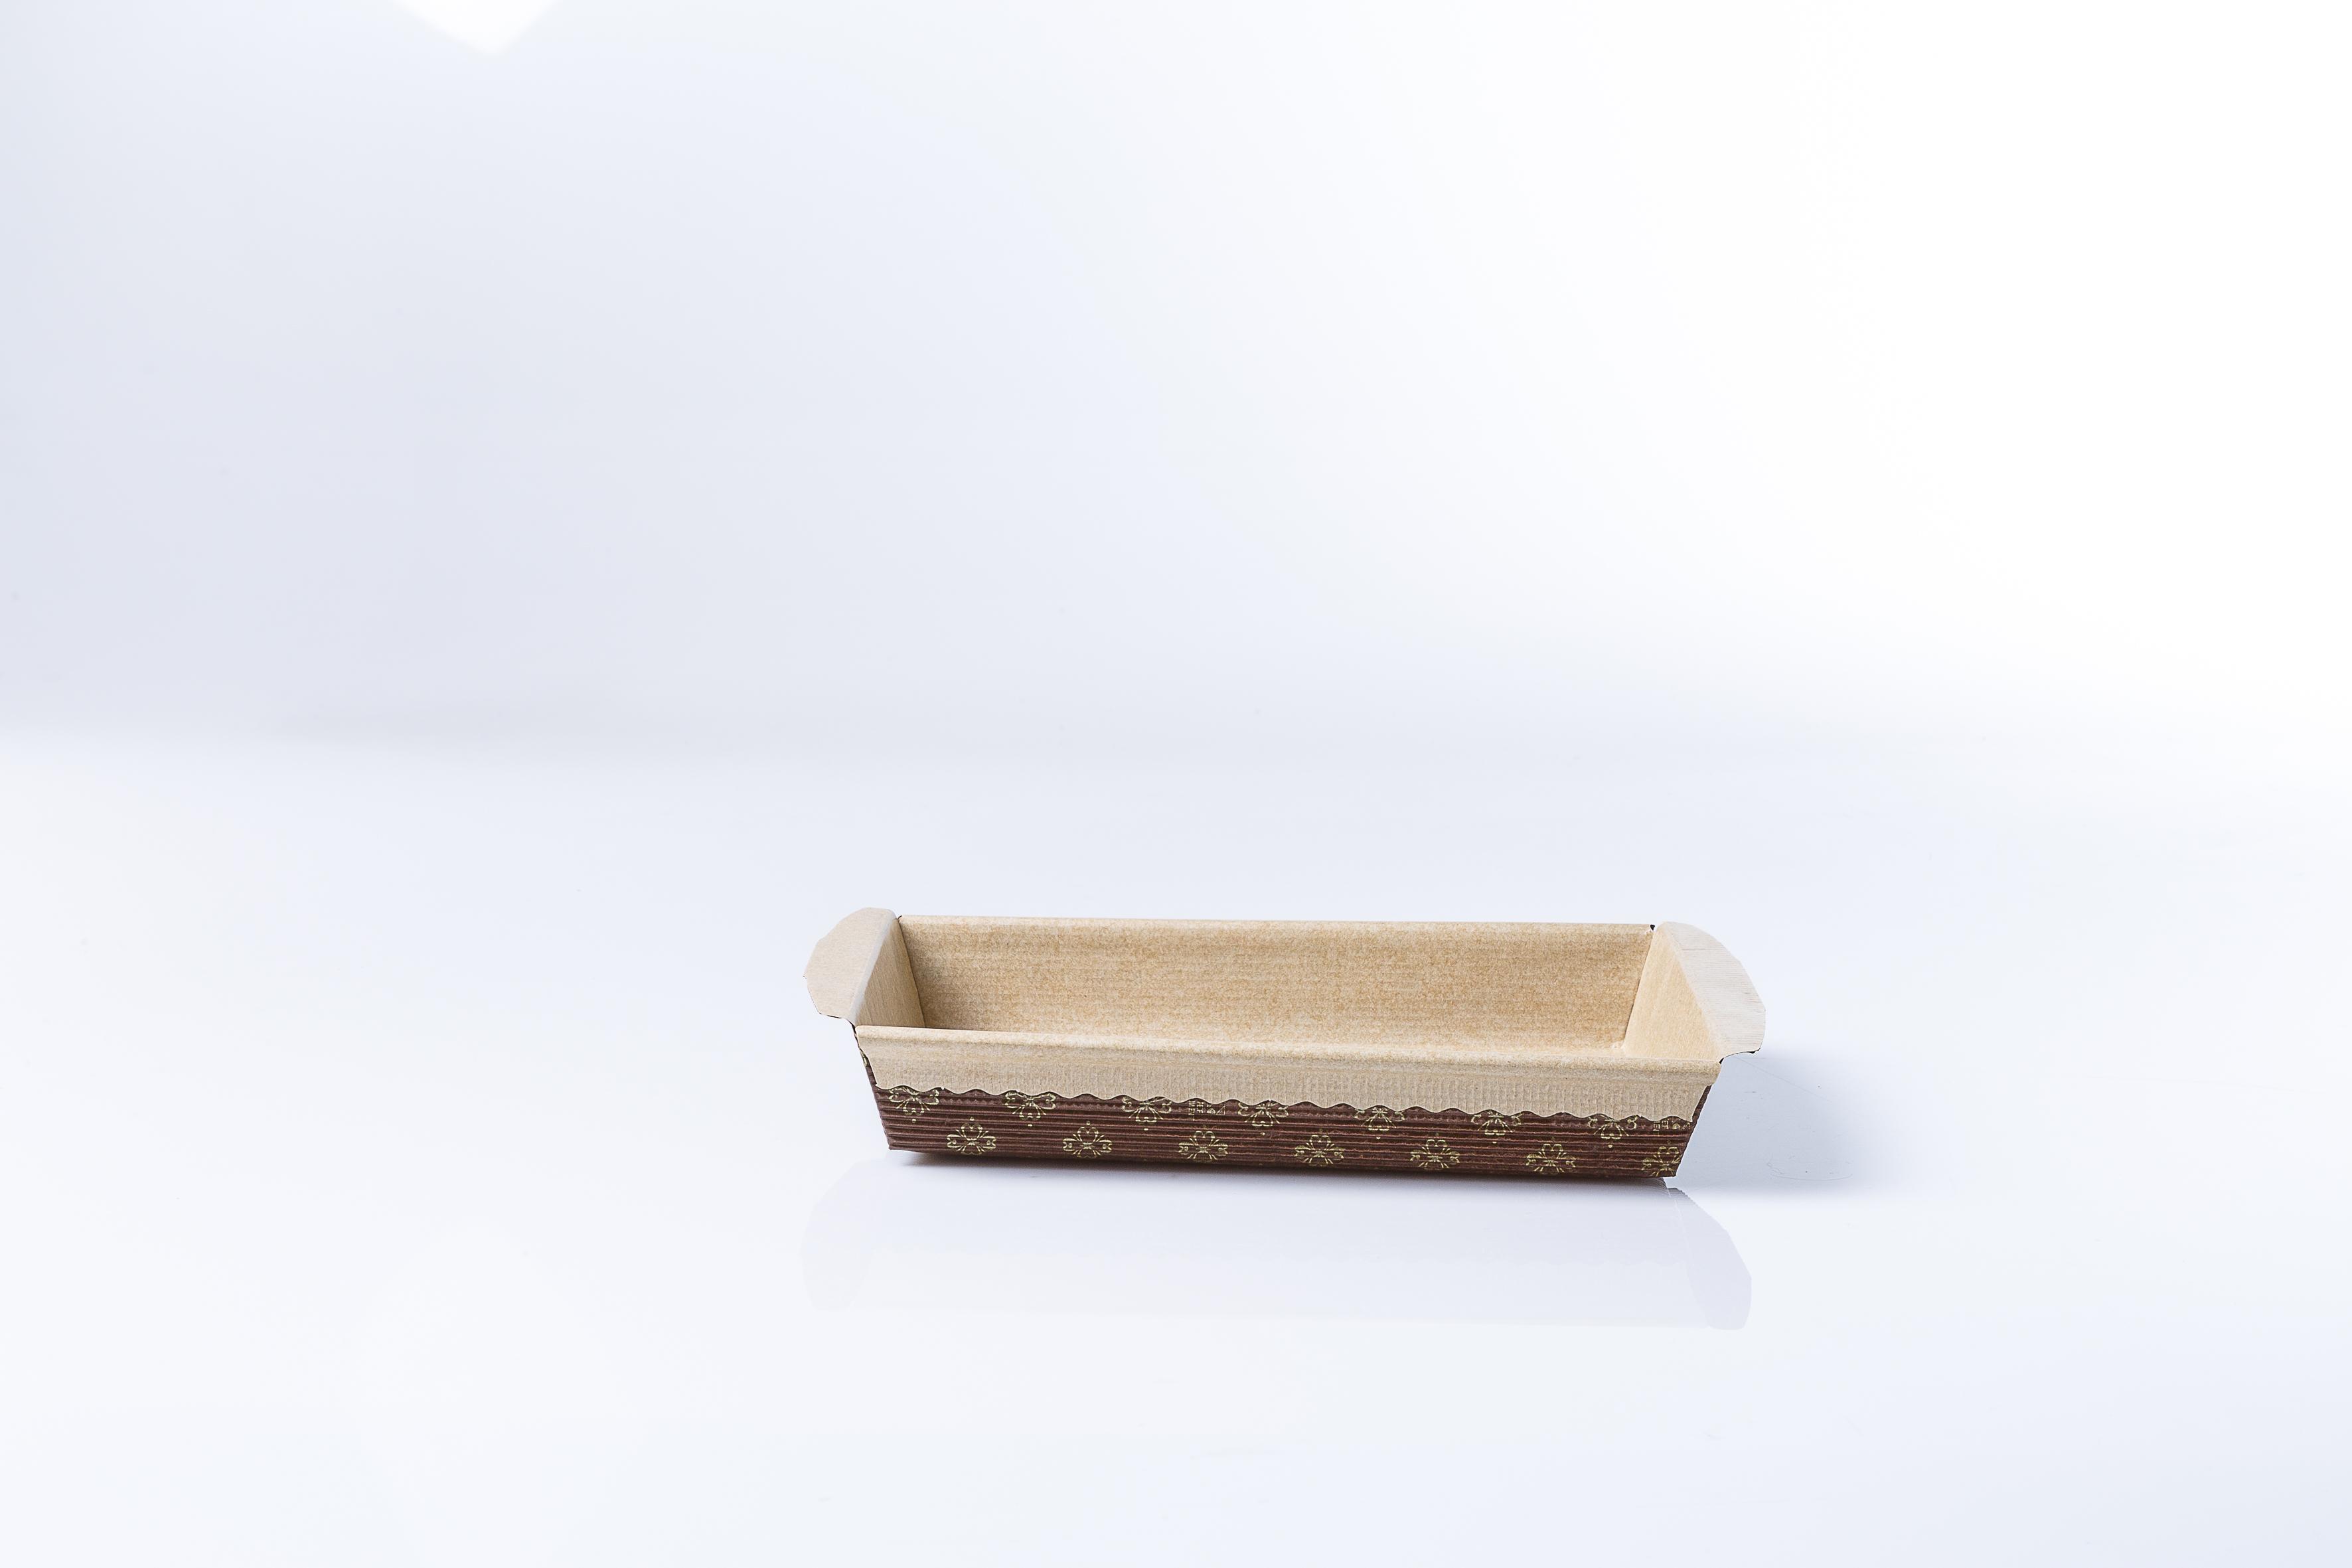 M.ITALIANO PLUM CAKE 300 GR - SUP: 21,5X15X3,5 CM BASE: 19X13,5 CM